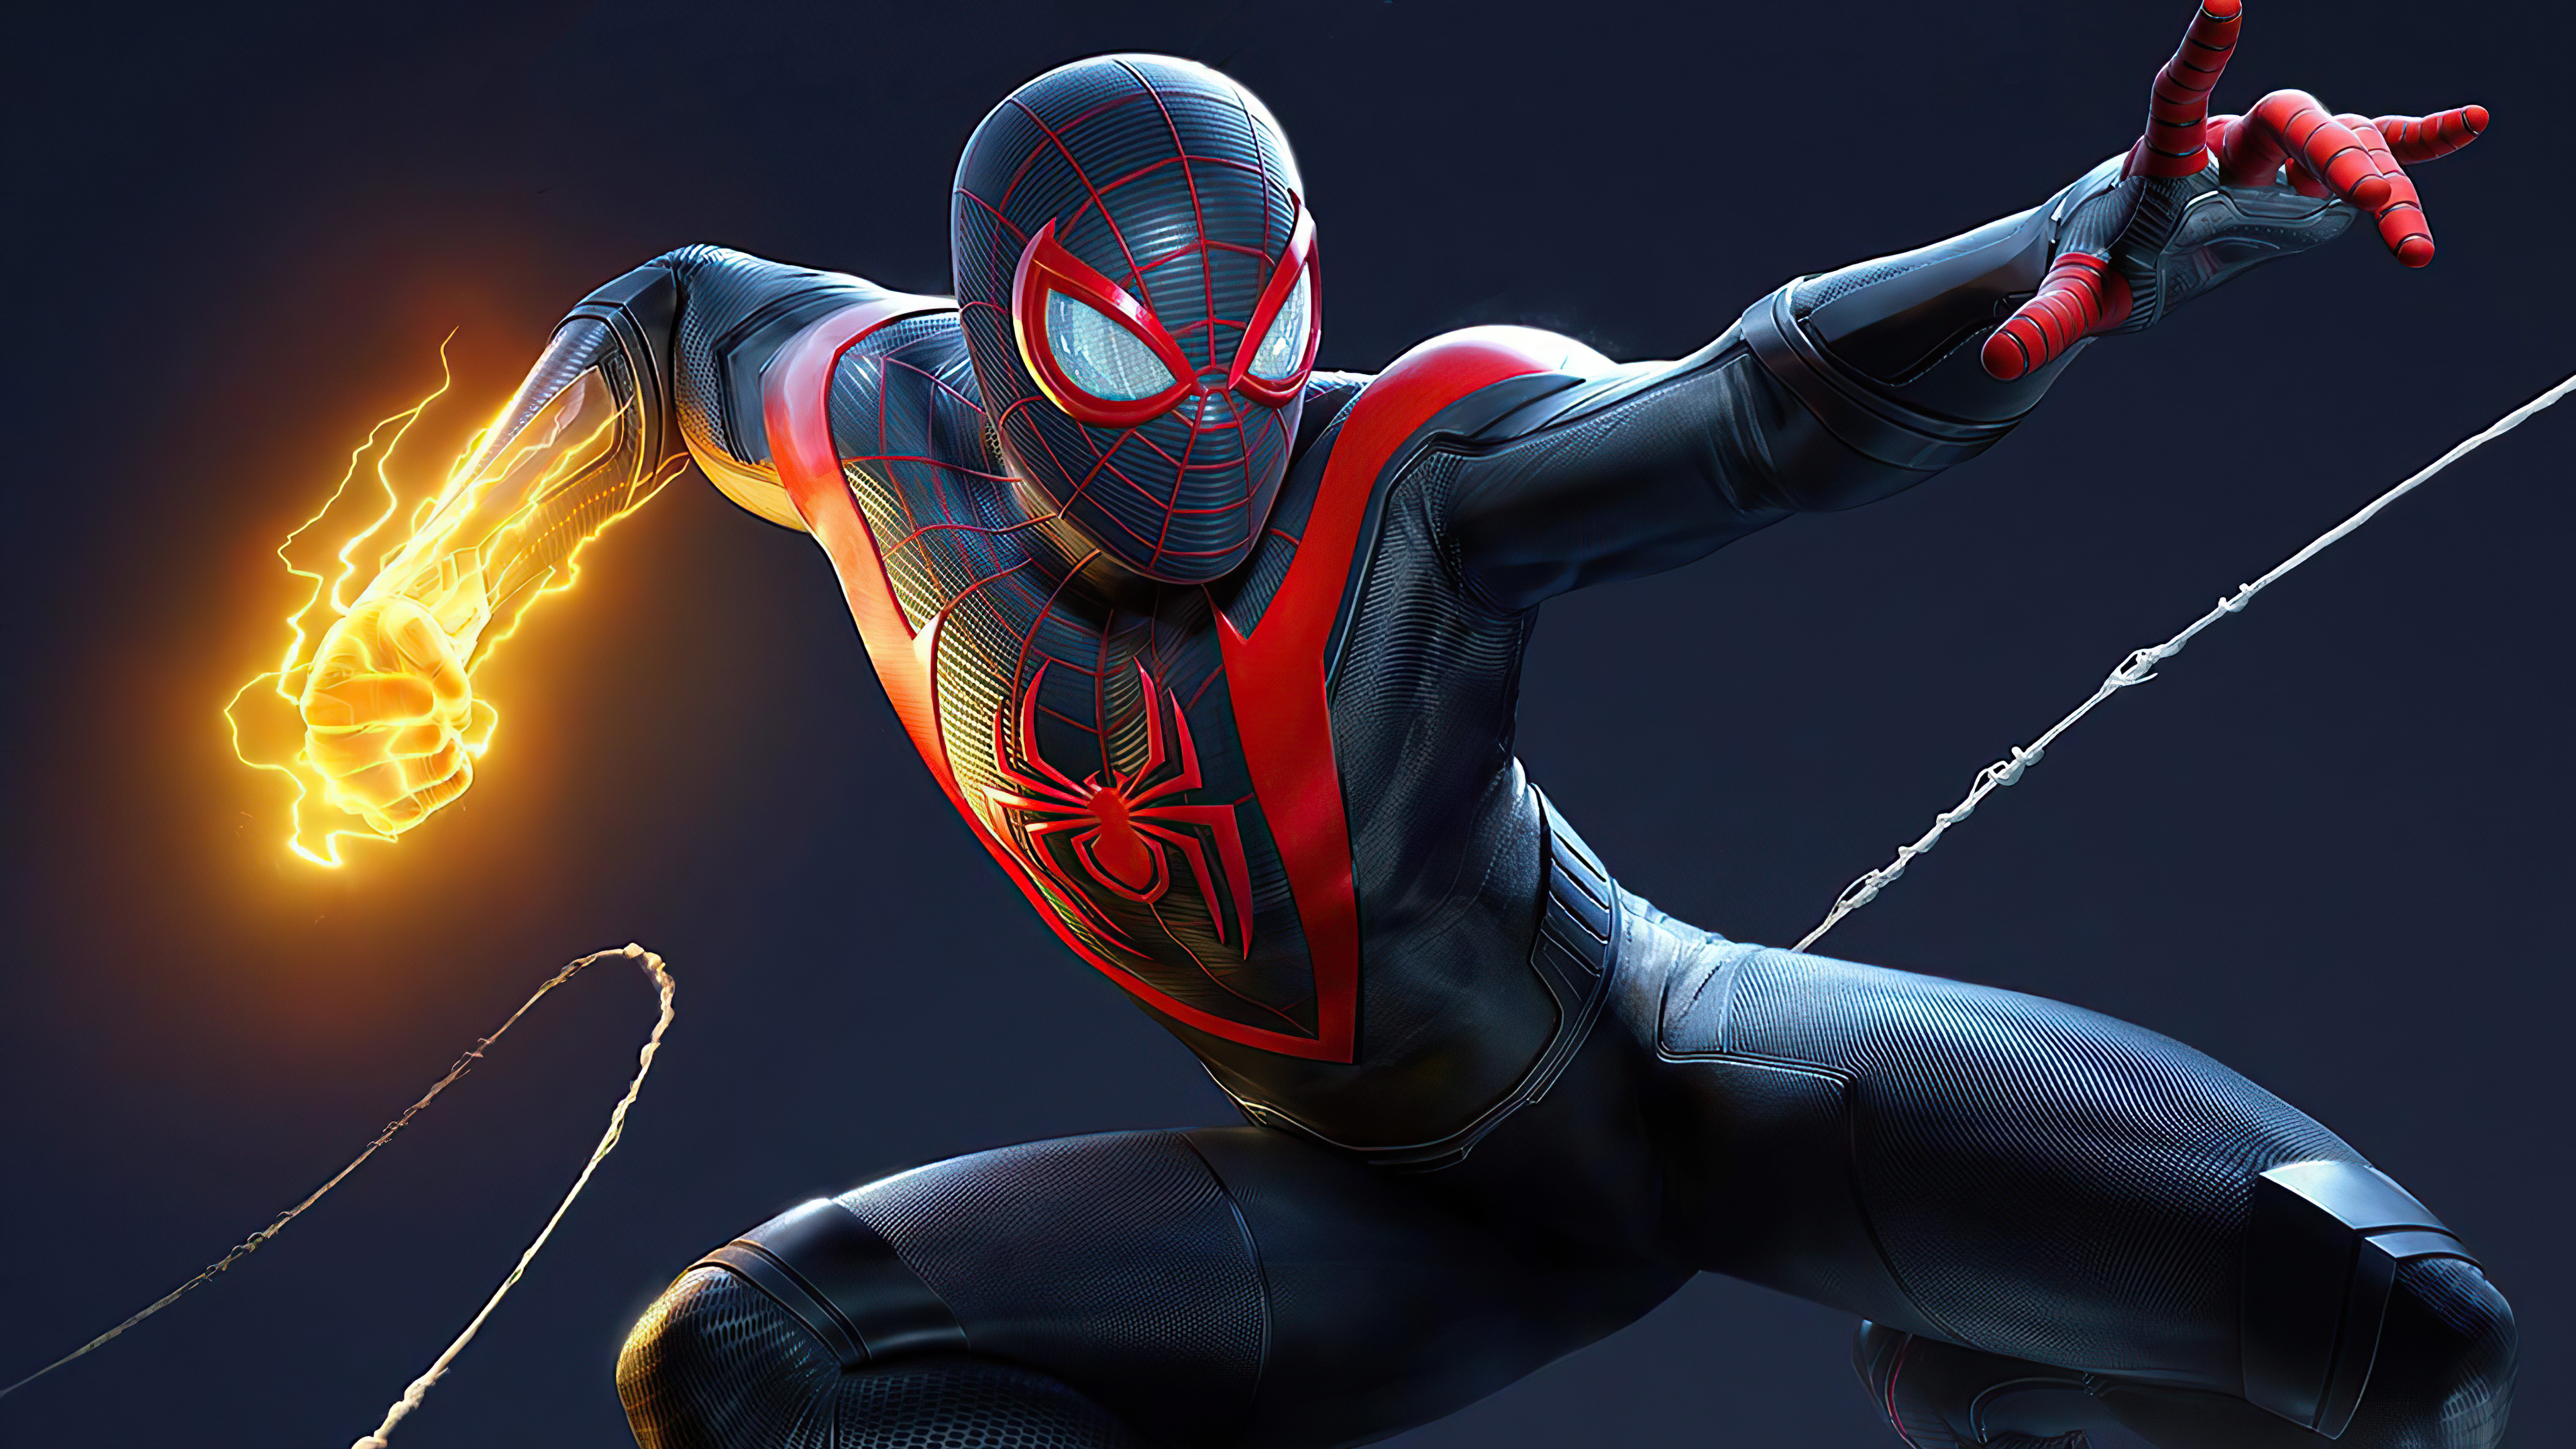 marvel spider man miles morales 1596989832 - Marvel Spider Man Miles Morales - Marvel Spider Man Miles Morales wallpapers